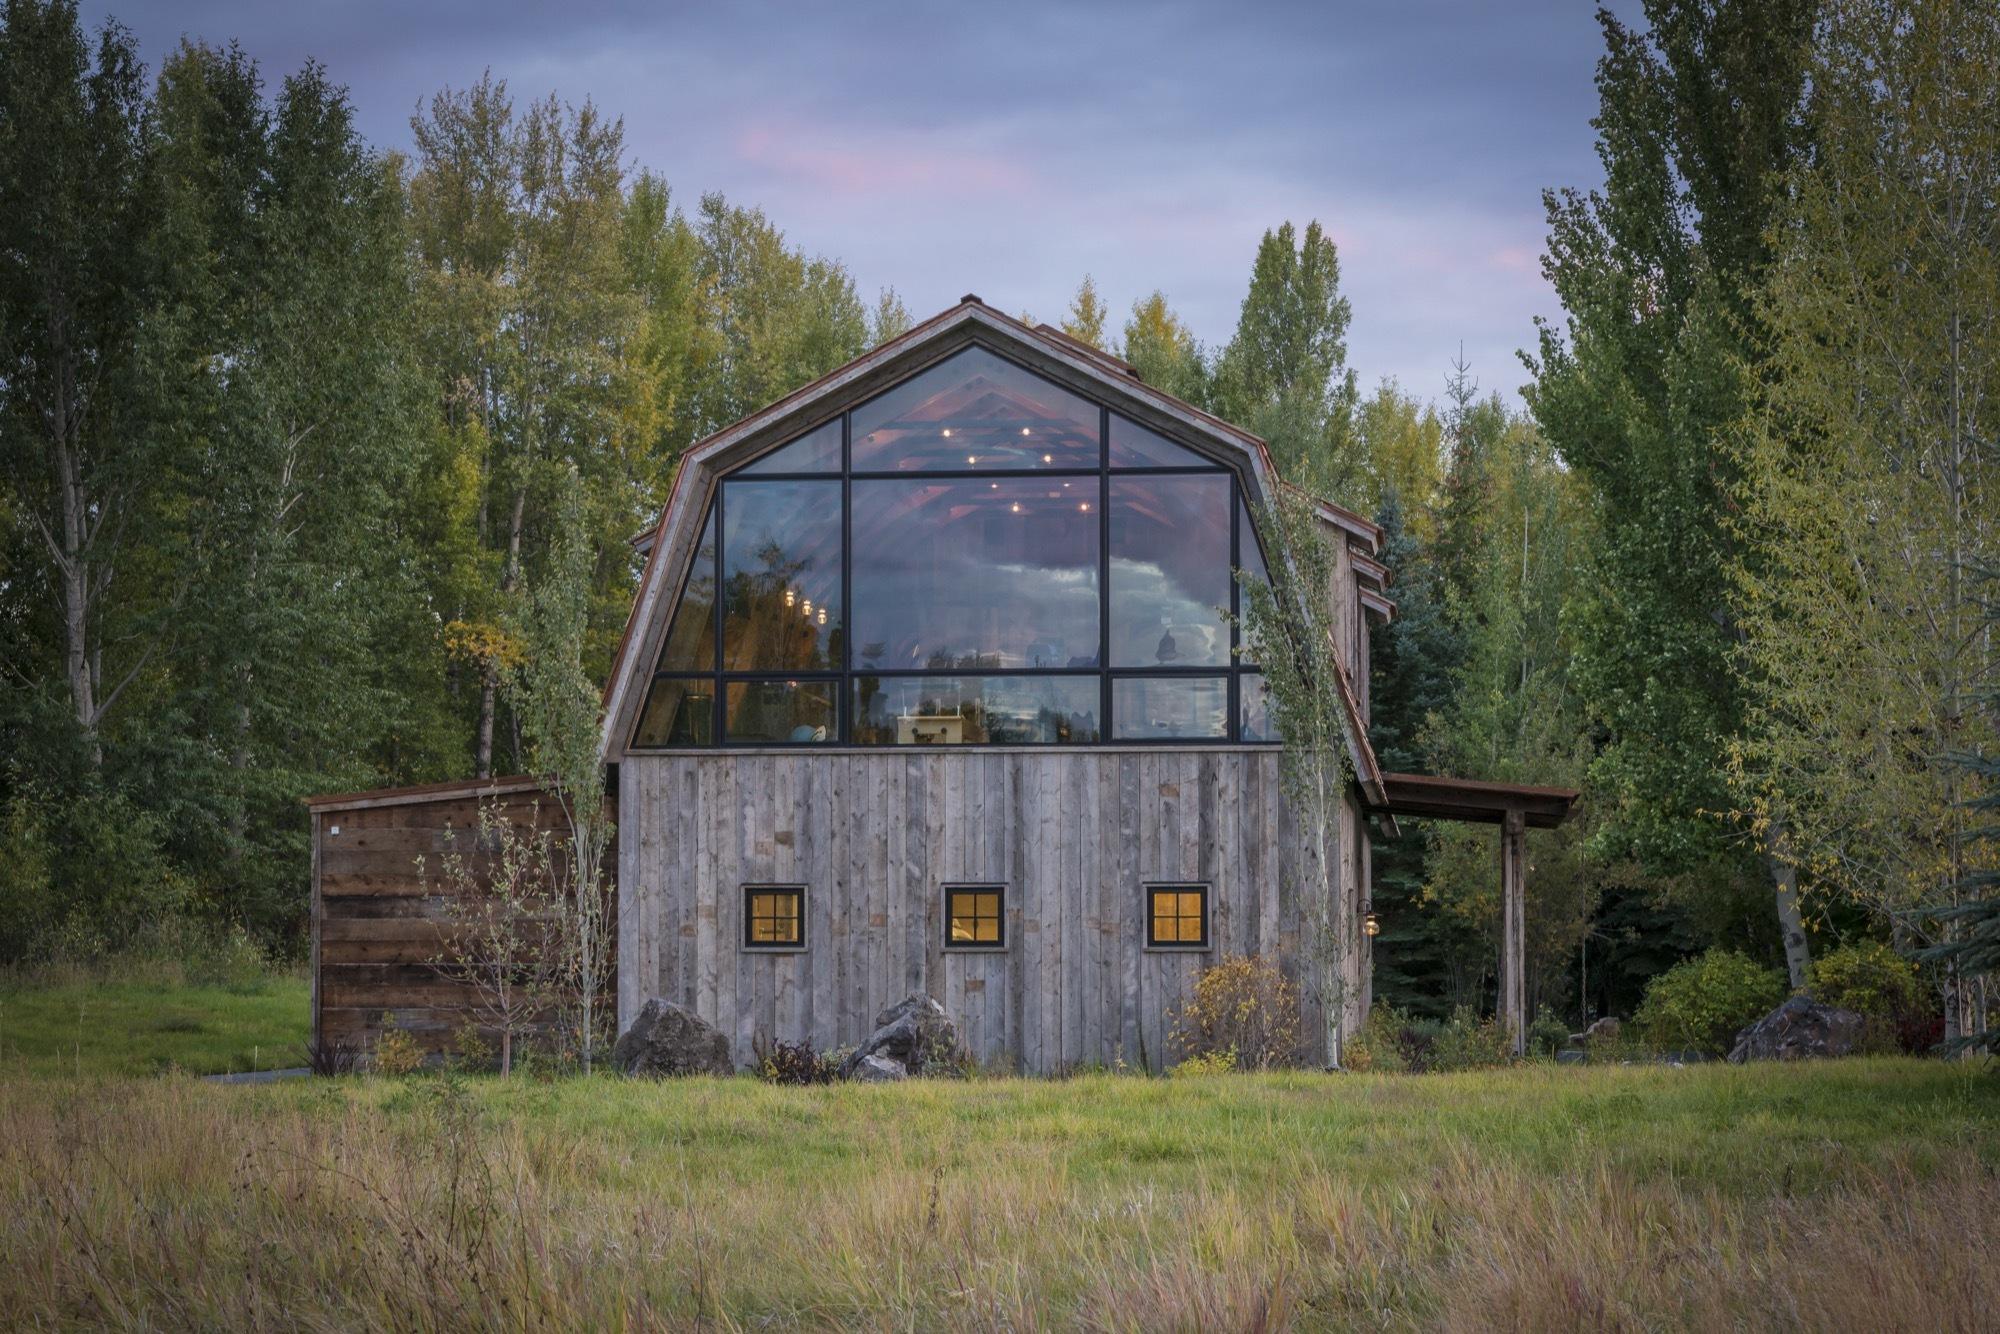 Gallery Of The Barn Carney Logan Burke Architects 20